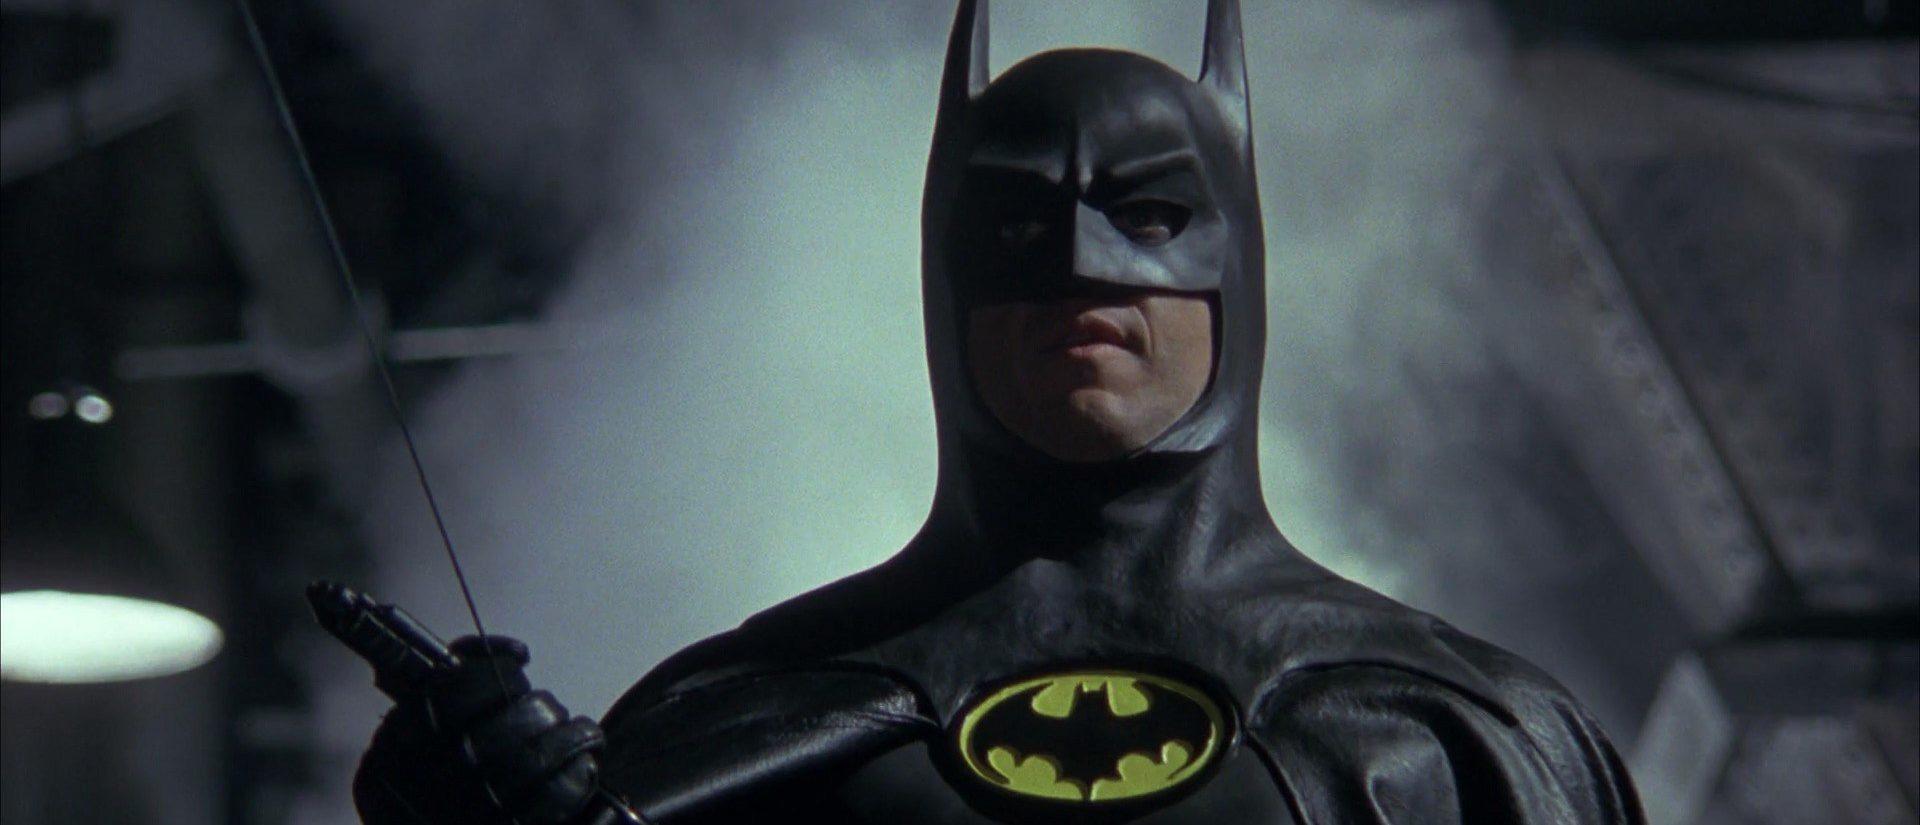 Se confirma que Michael Keaton aparecerá en The Flash como Batman -  HobbyConsolas Entretenimiento